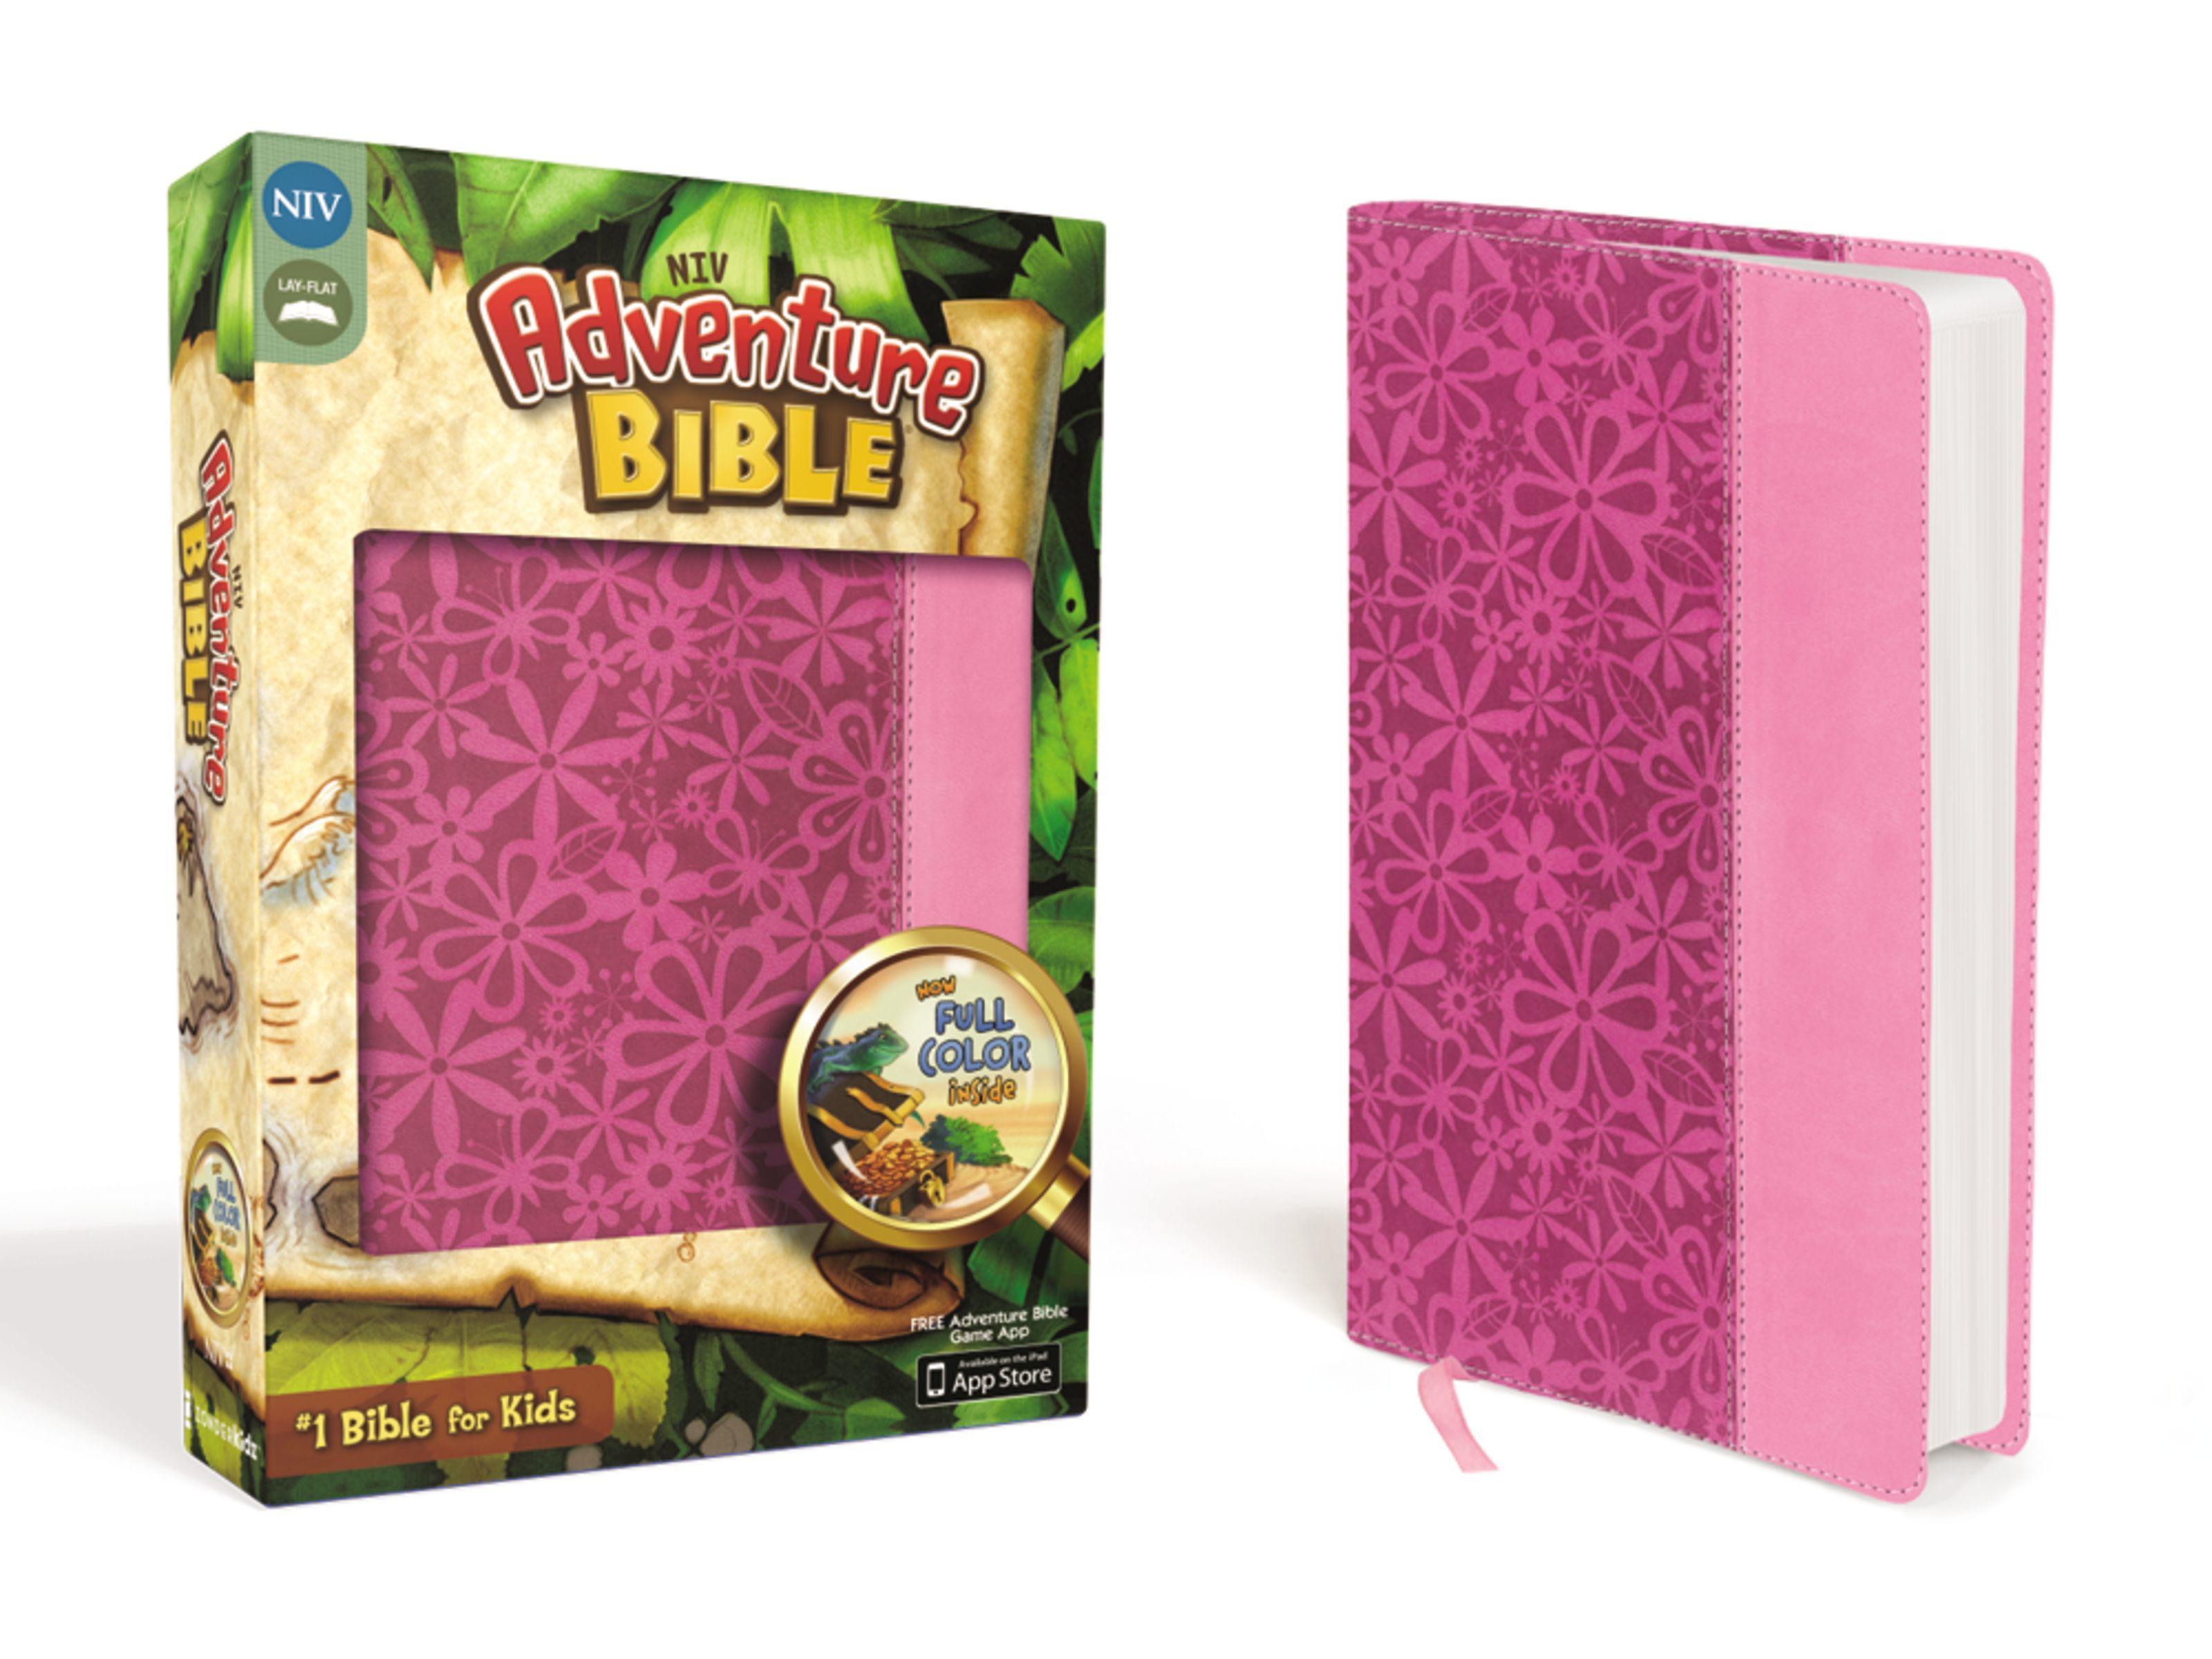 NIV Adventure Bible- Pink Floral Pattern